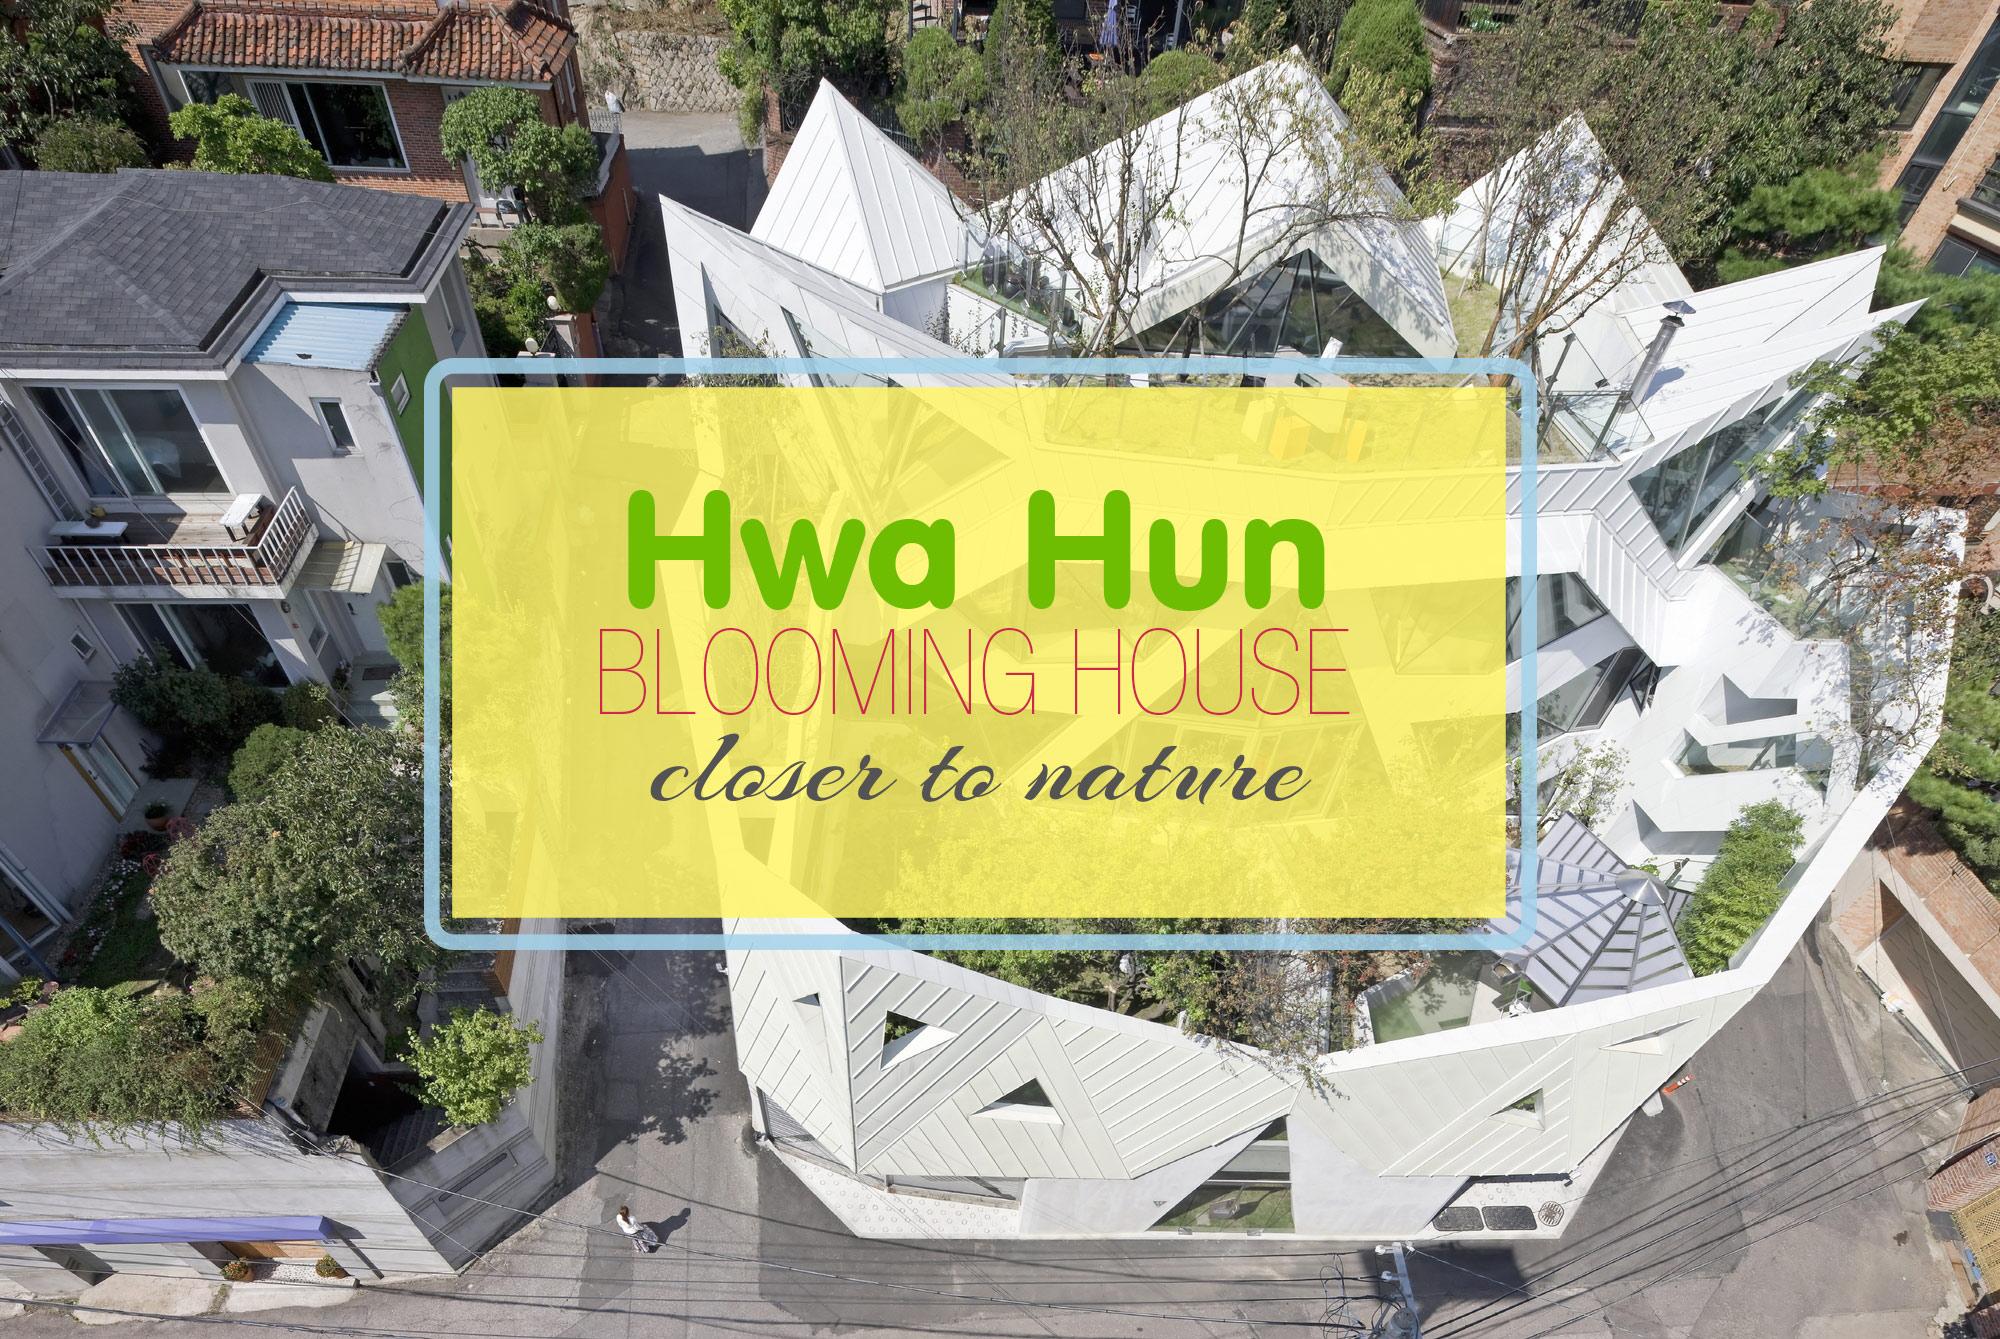 Hwa-Hun-just3ds.com